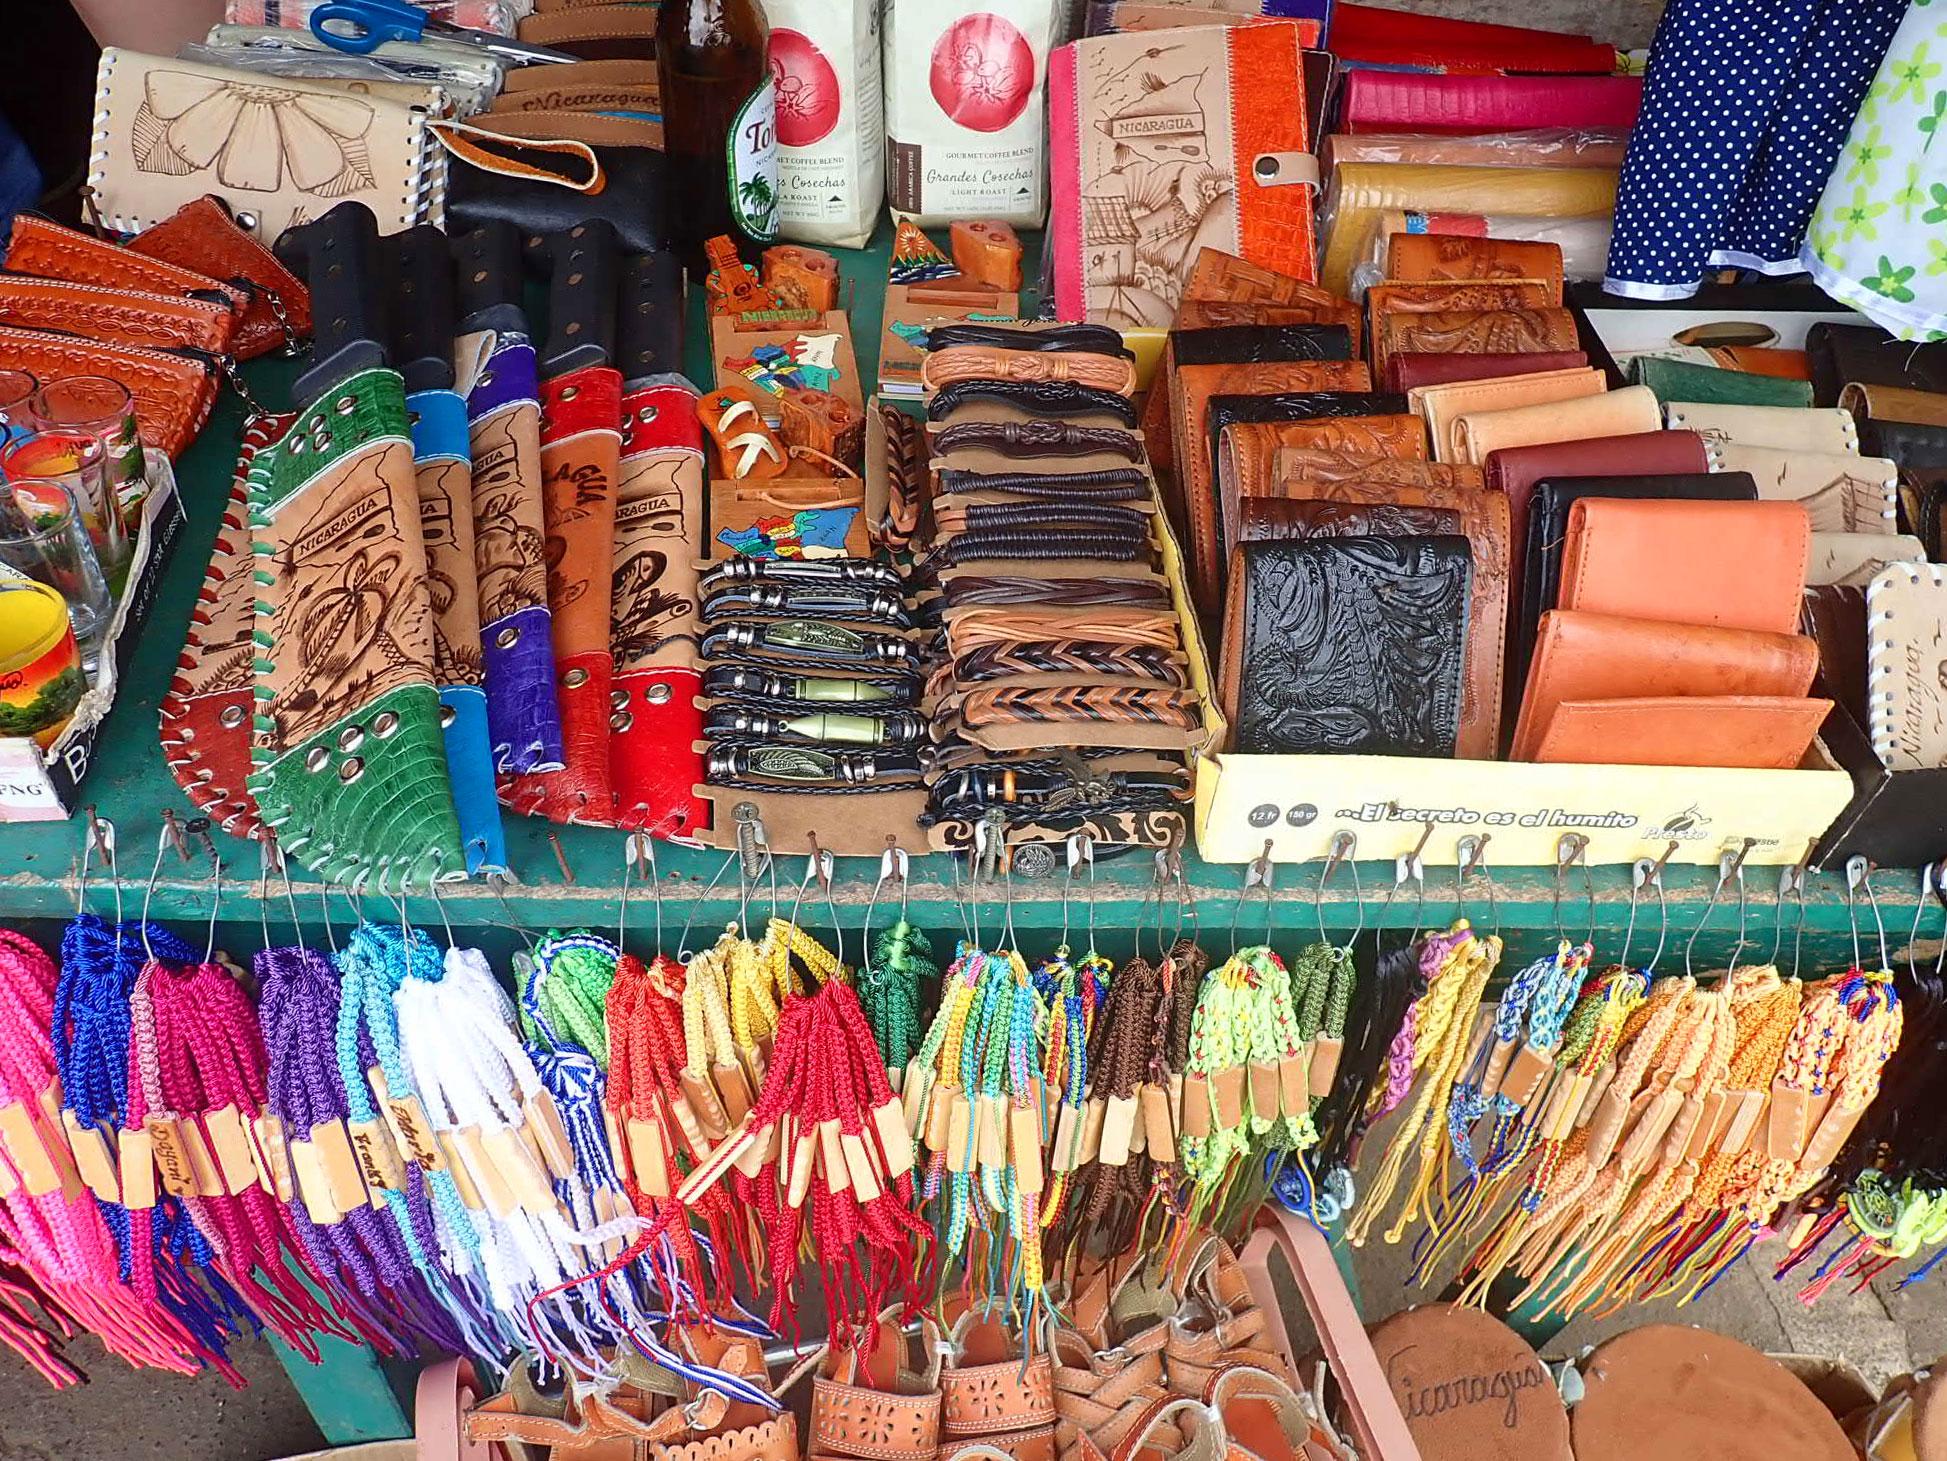 Masaya Market | Mercado Masaya | Nicaragua Travel | Masaya, Nicaragua | Nicaragua | Nicaragua Bucket List | Nicaragua travel guide | www.anajacqueline.com